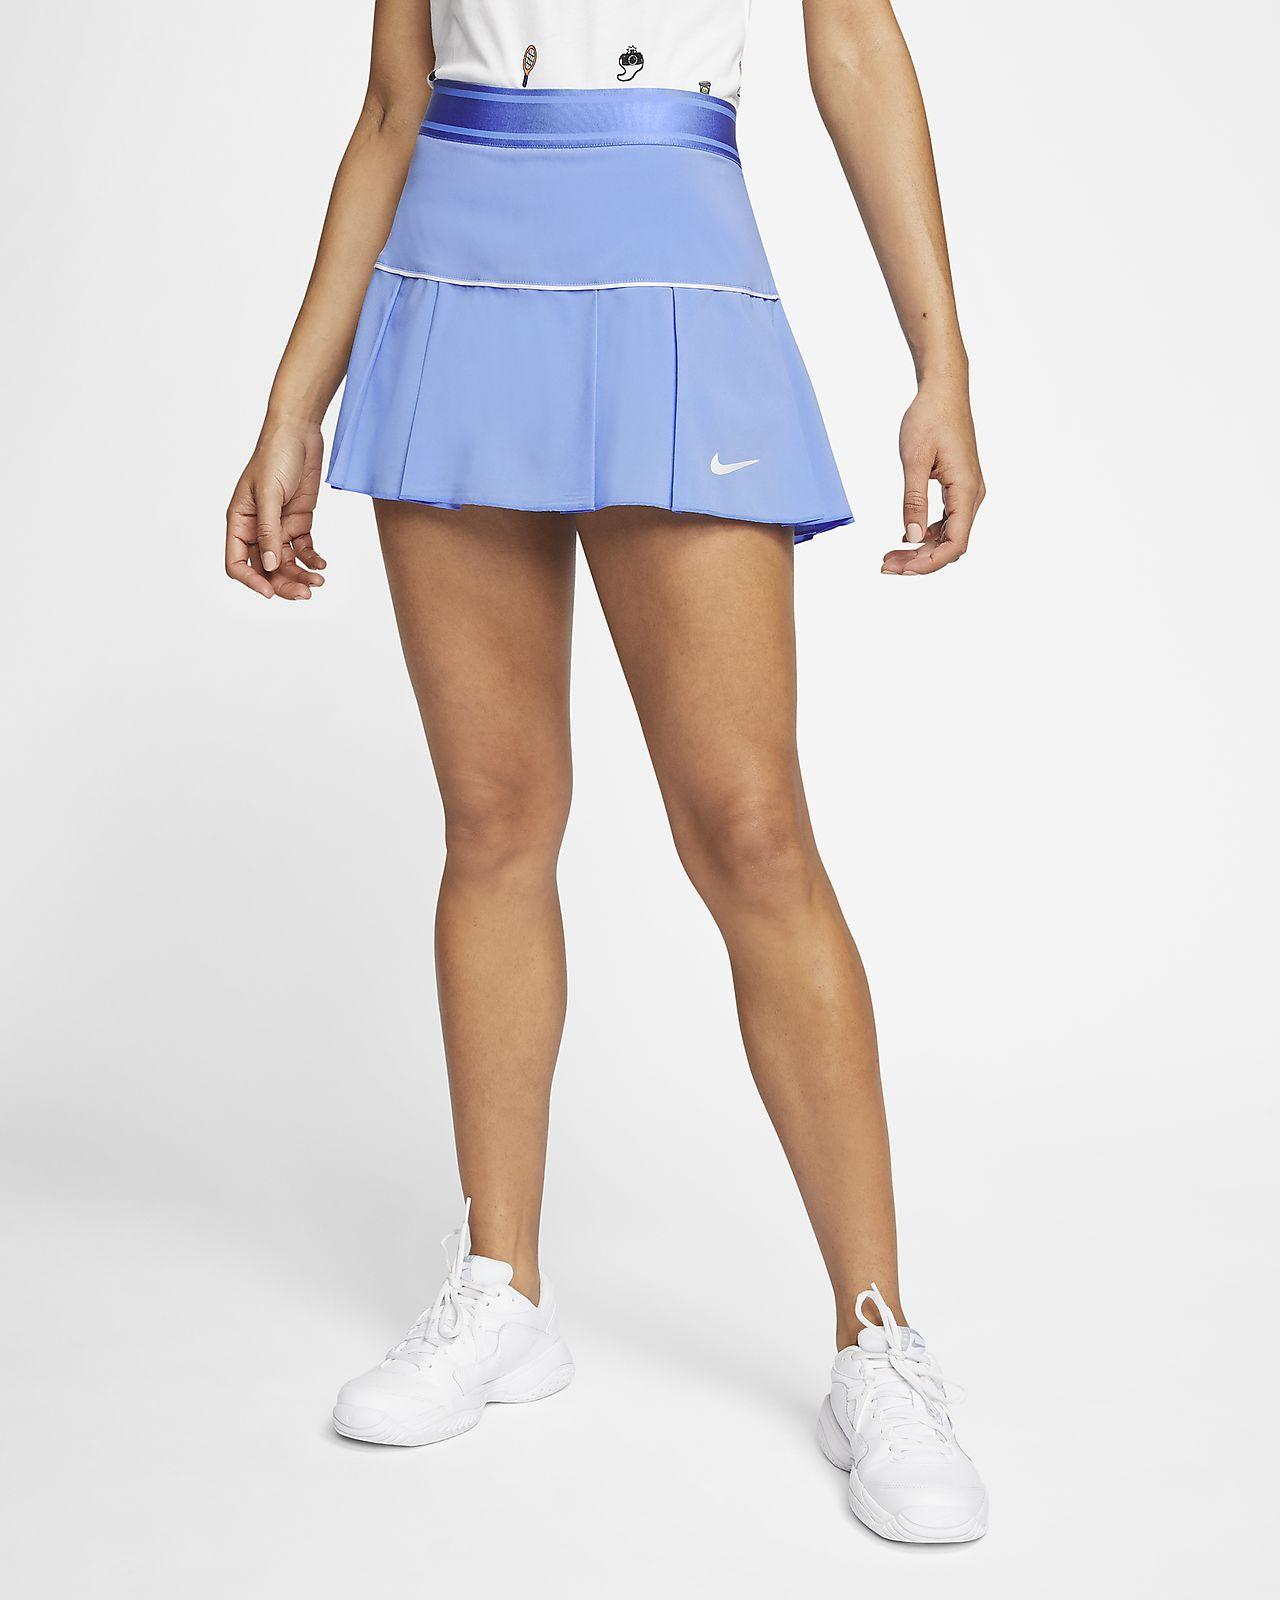 Nikecourt Victory Women S Tennis Skirt Nike Com In 2020 Womens Tennis Skirts Tennis Skirt Outfit Tennis Skirt